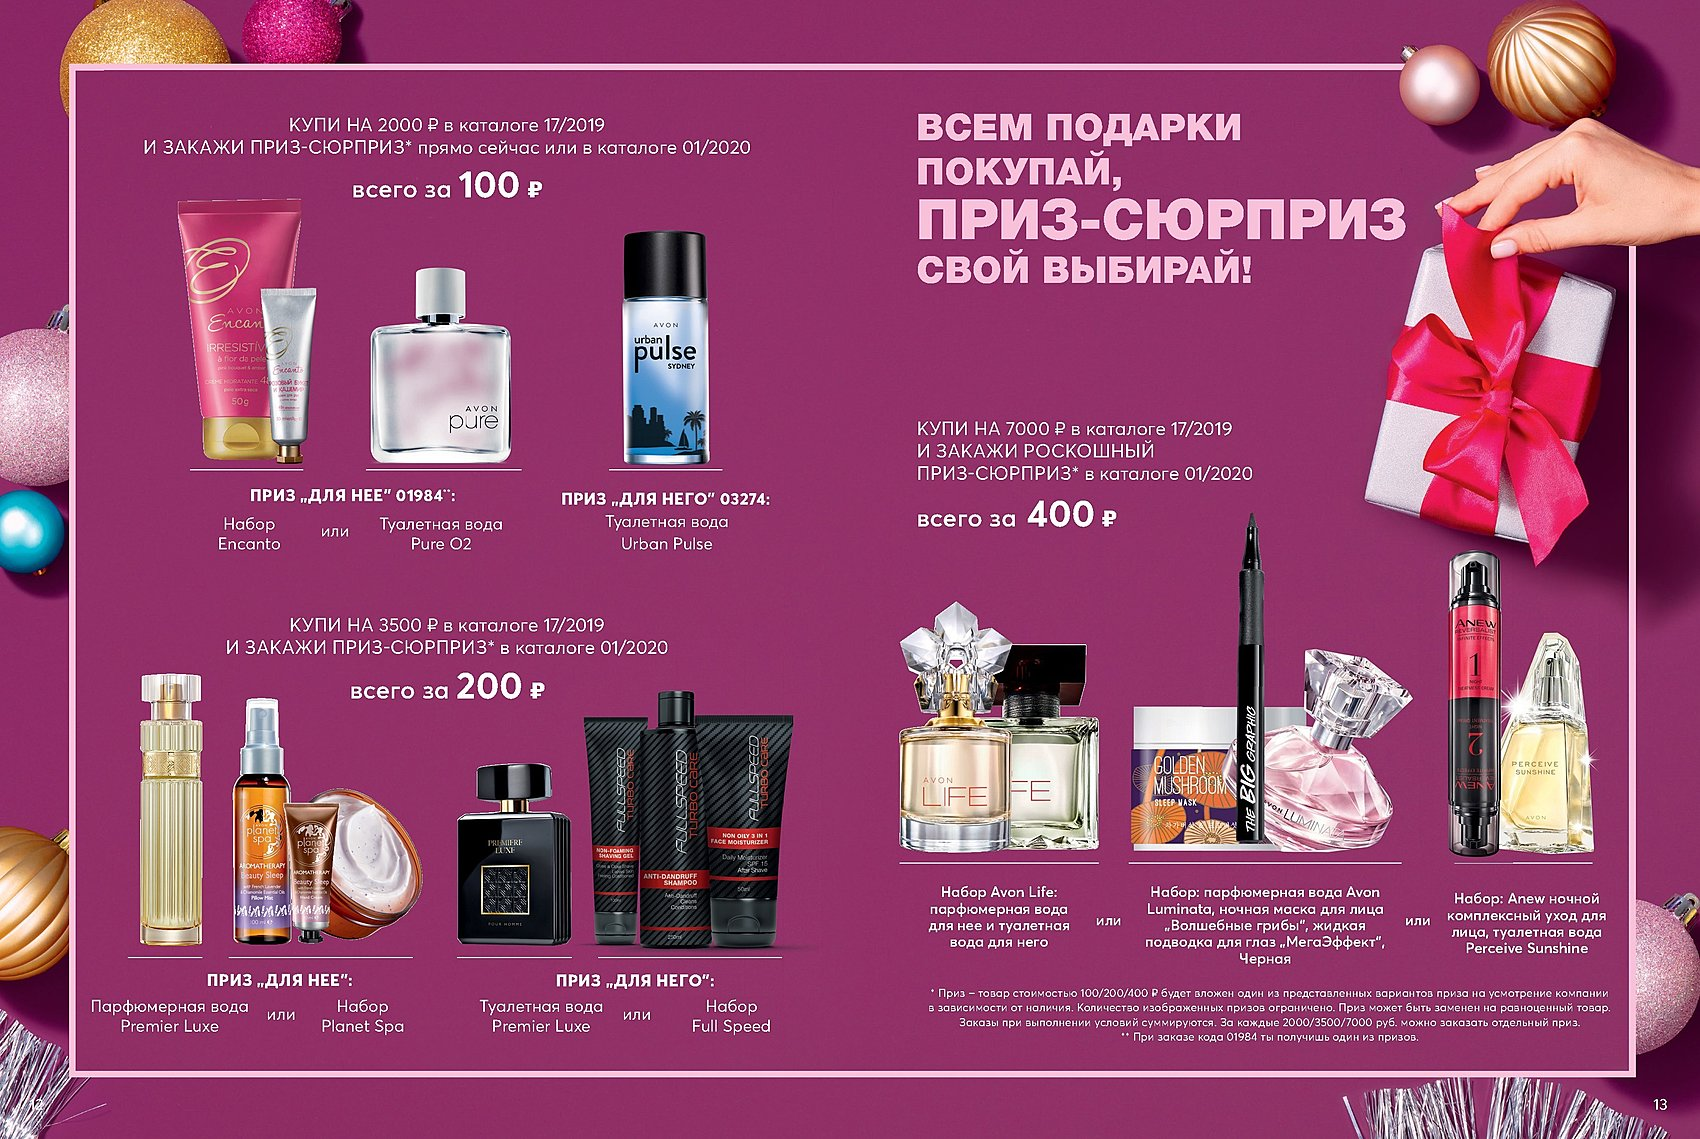 Акции эйвон под кодом купит косметику флормар в украине